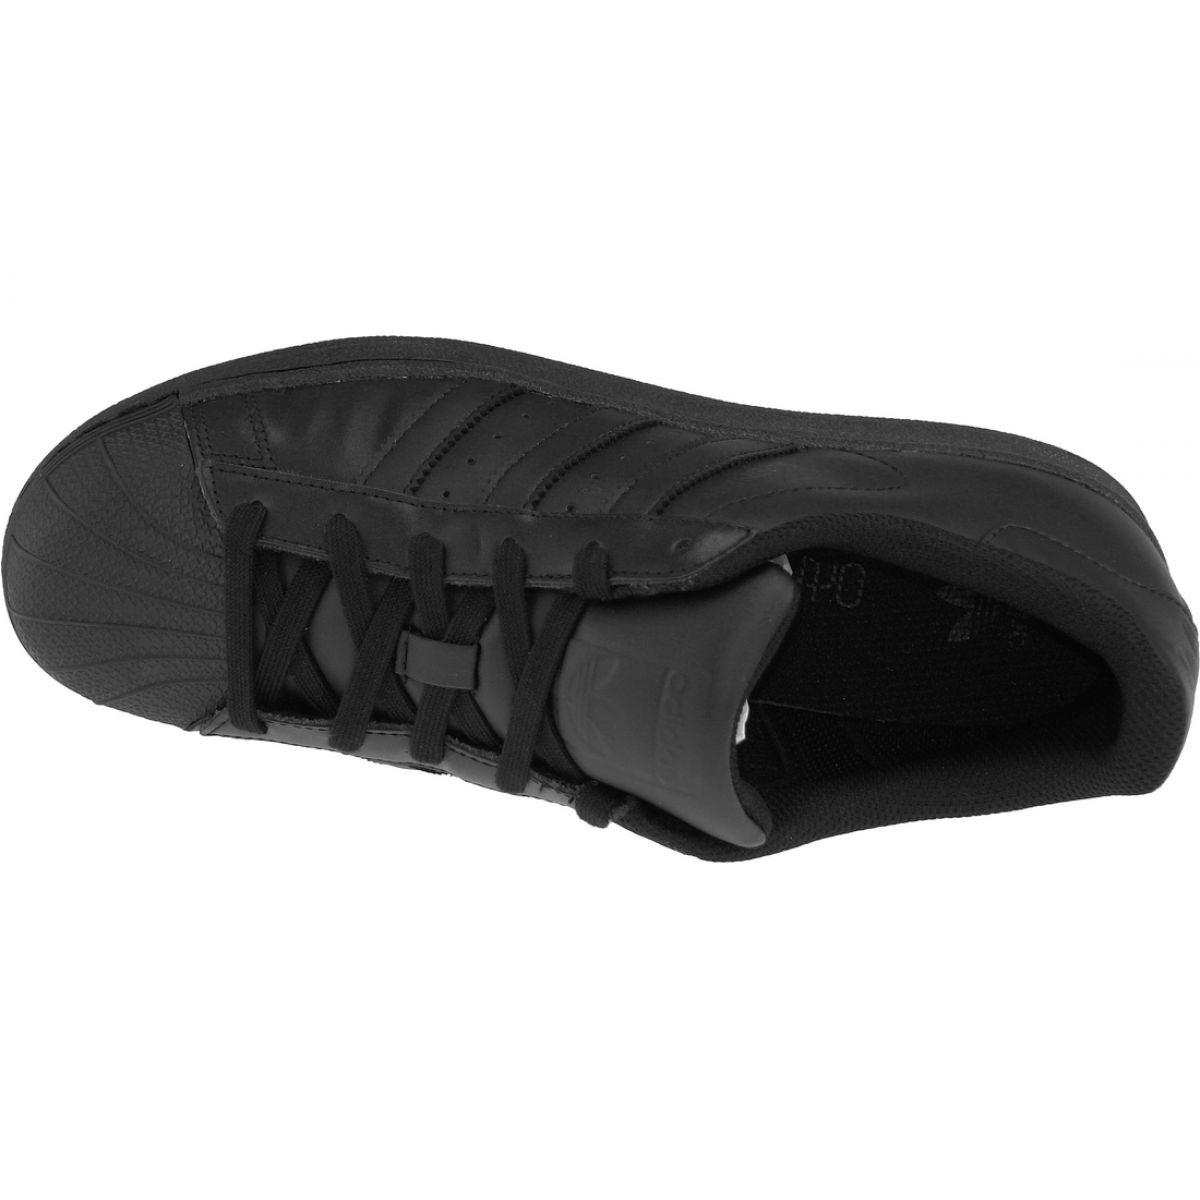 Buty adidas Superstar J Foundation Jr B25724 r.35,5